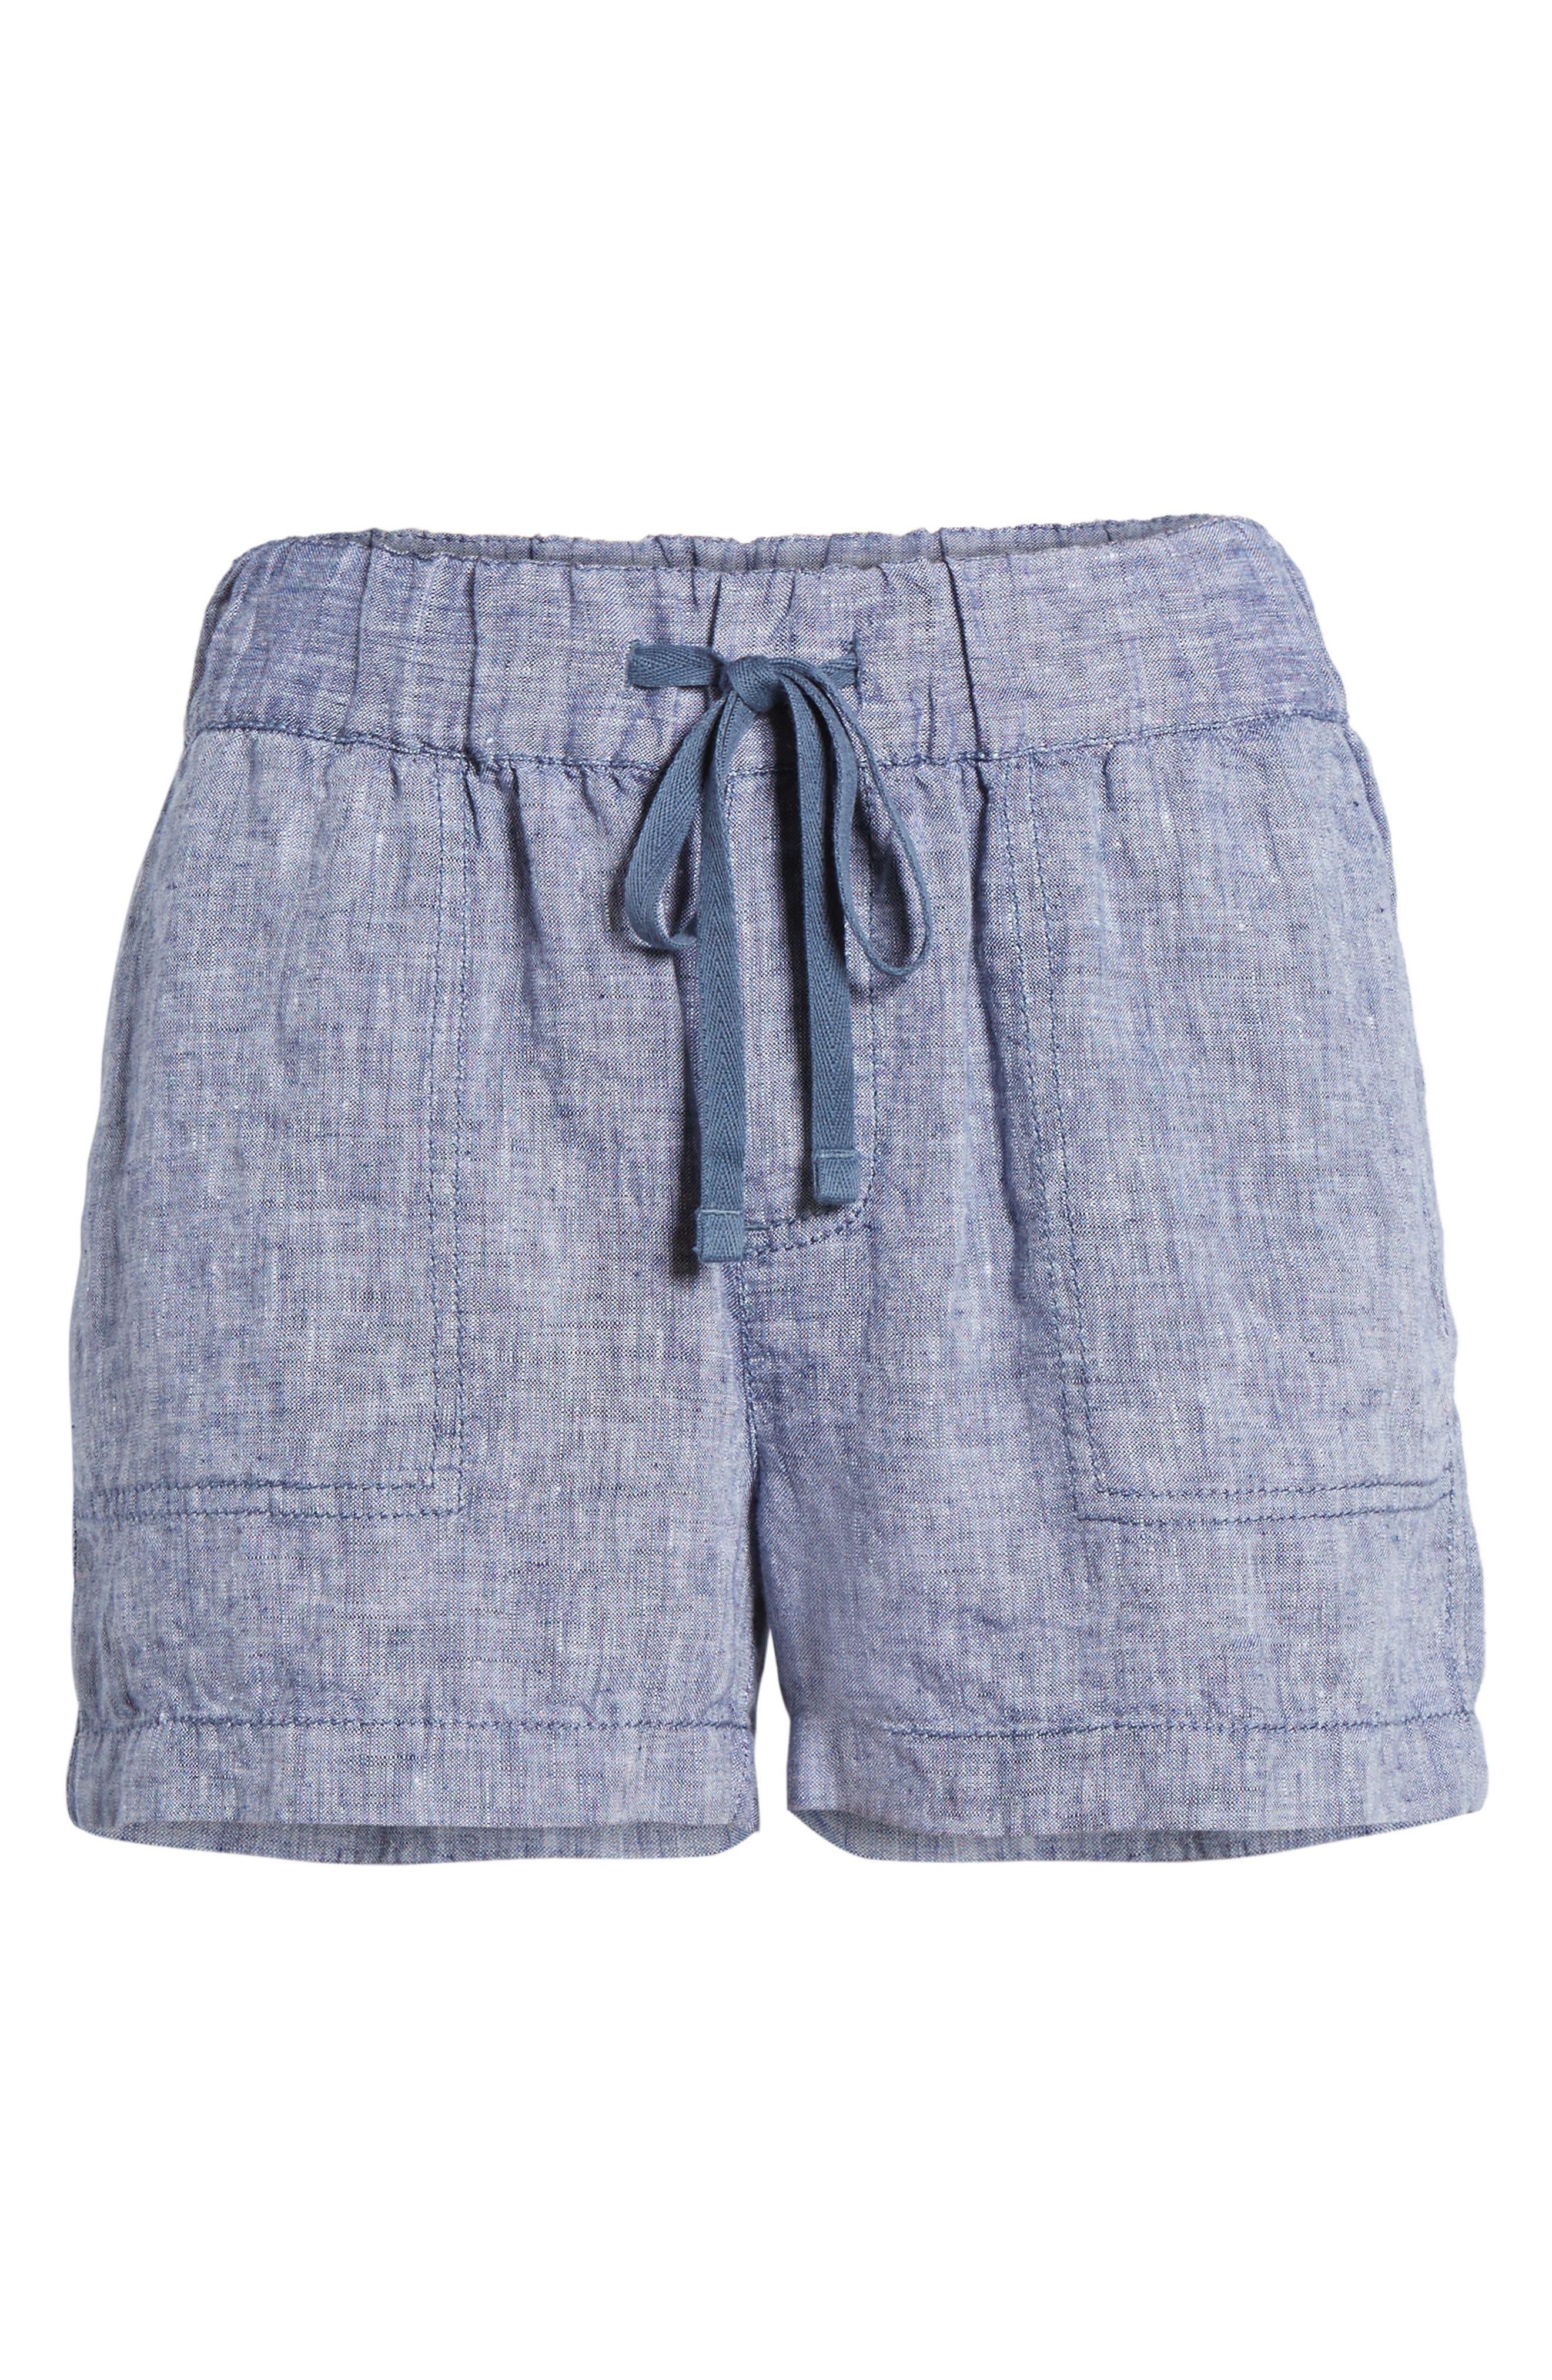 Linen Shorts,                             Alternate thumbnail 6, color,                             NAVY CROSSDYE